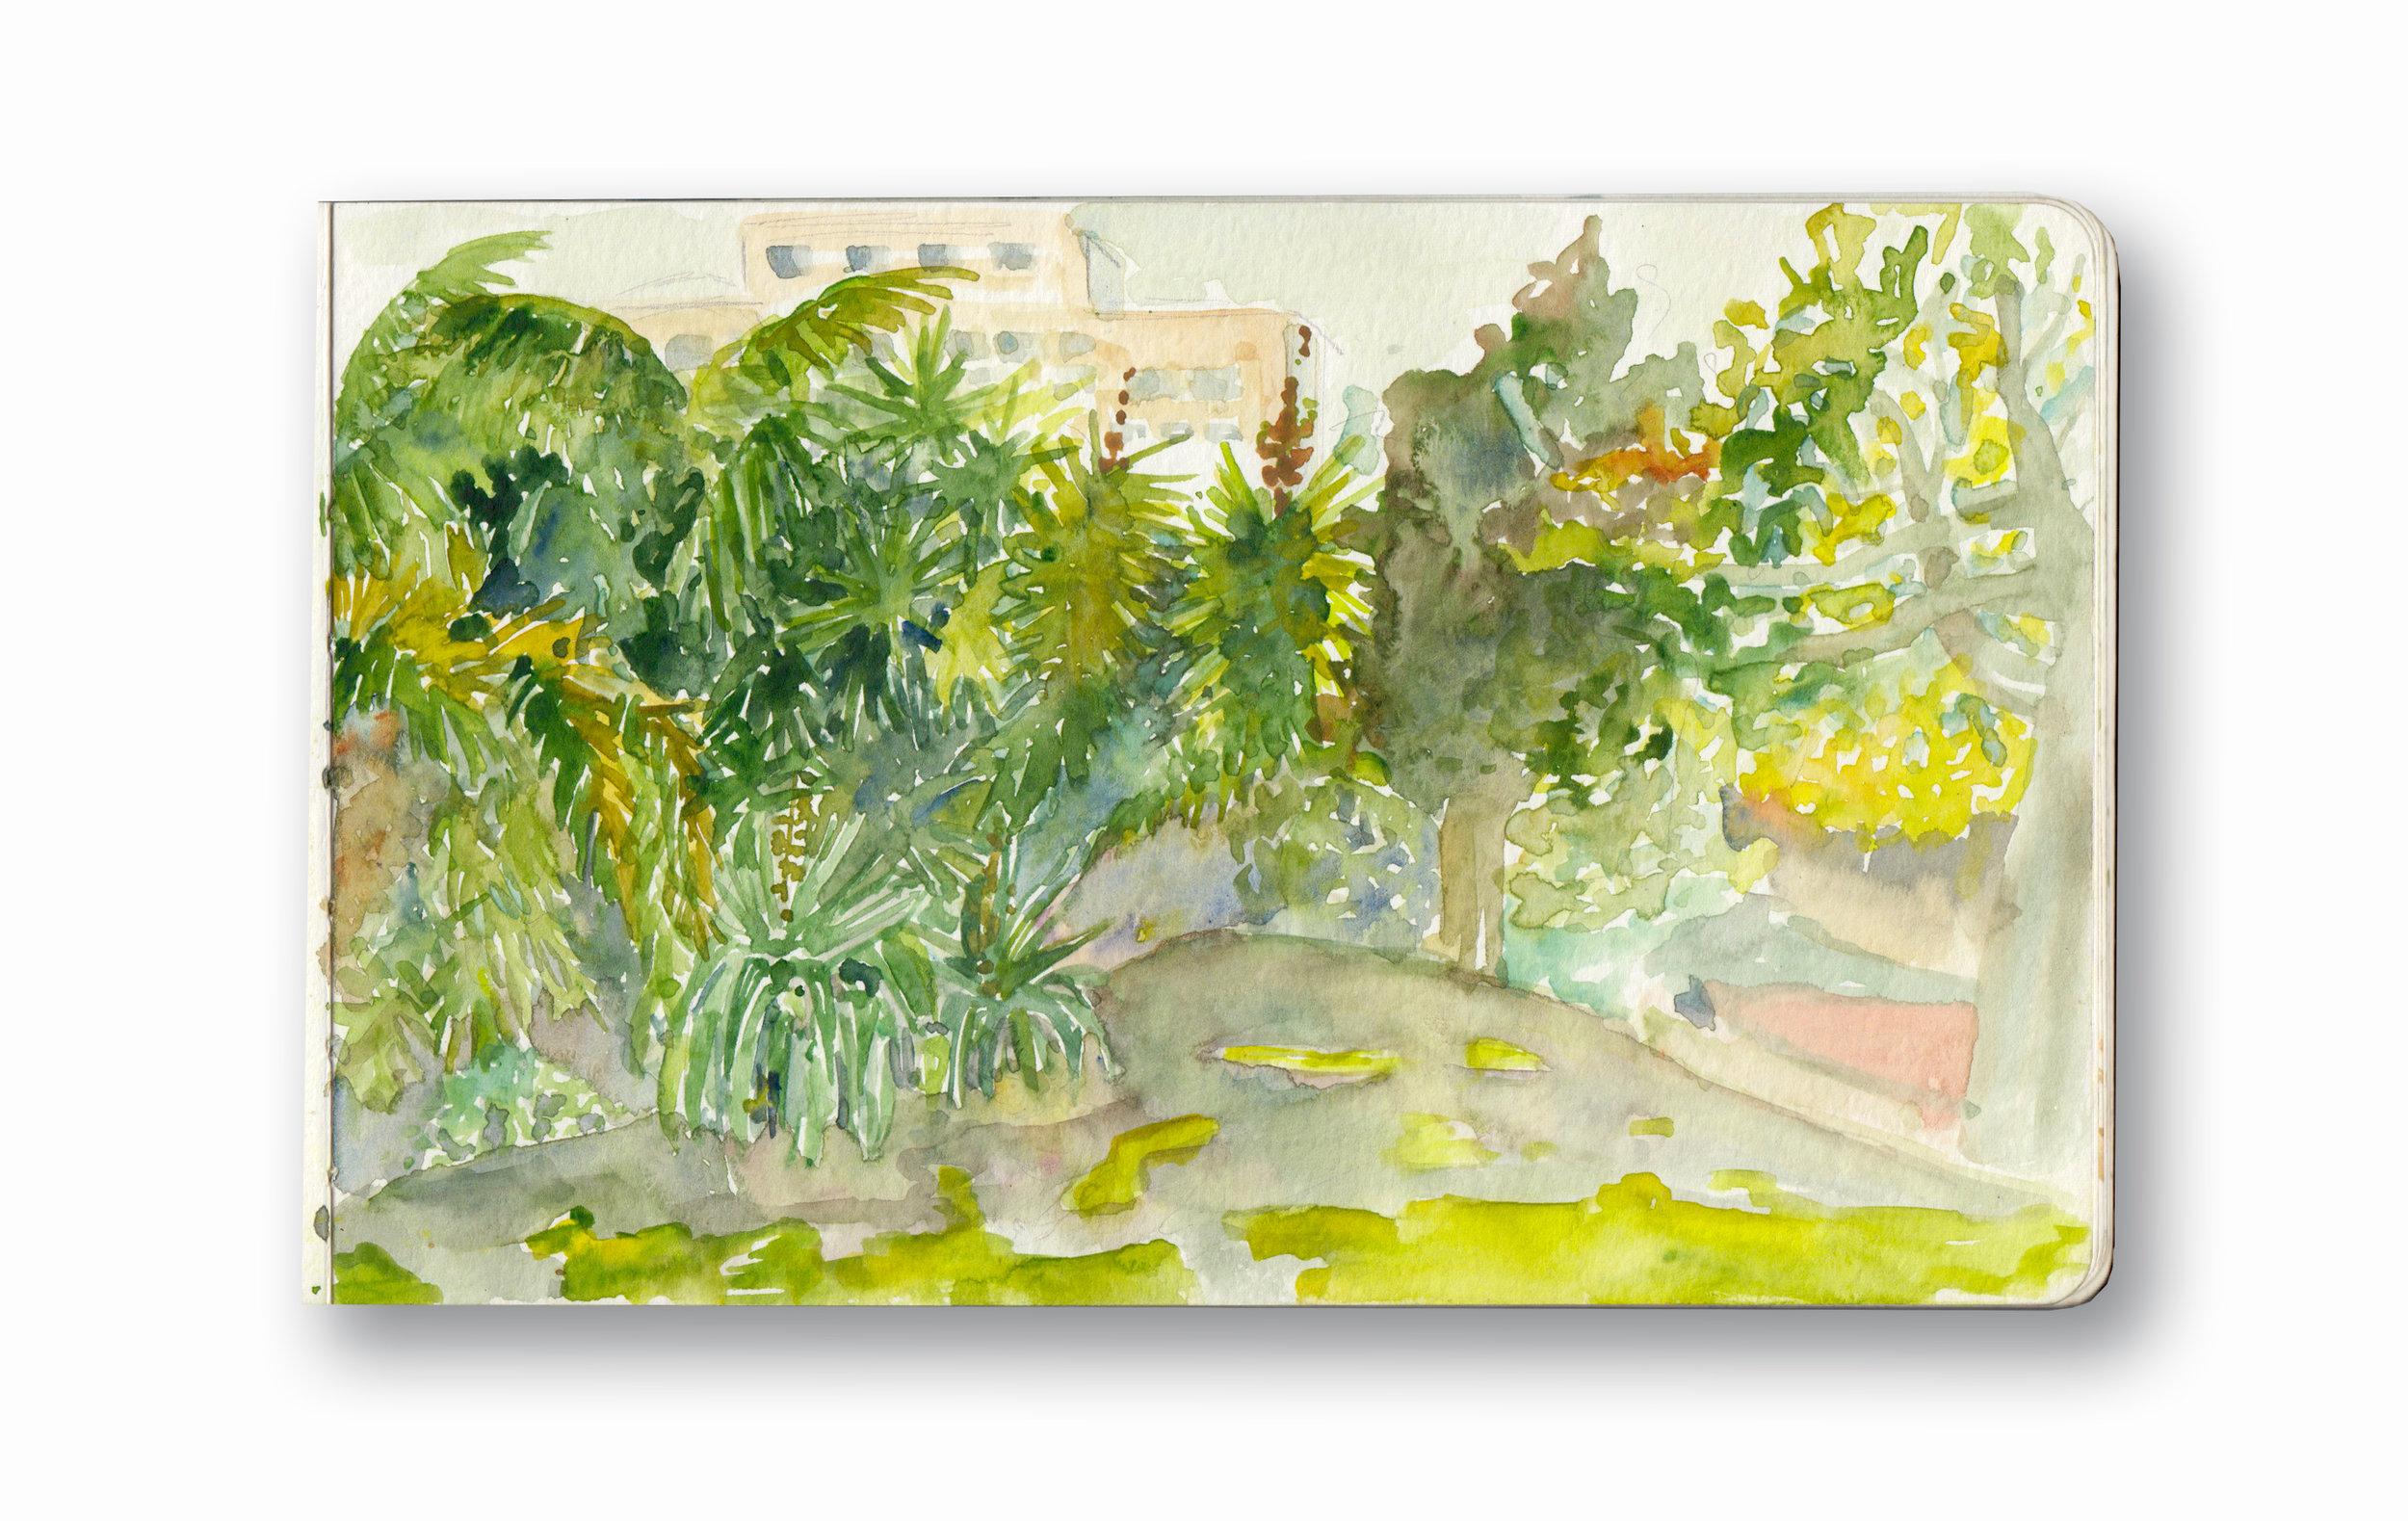 "Company's Gardens - Cape Town, SA  Watercolor & Gouache - MOleskine Sketchbook 5 x 8.25"""